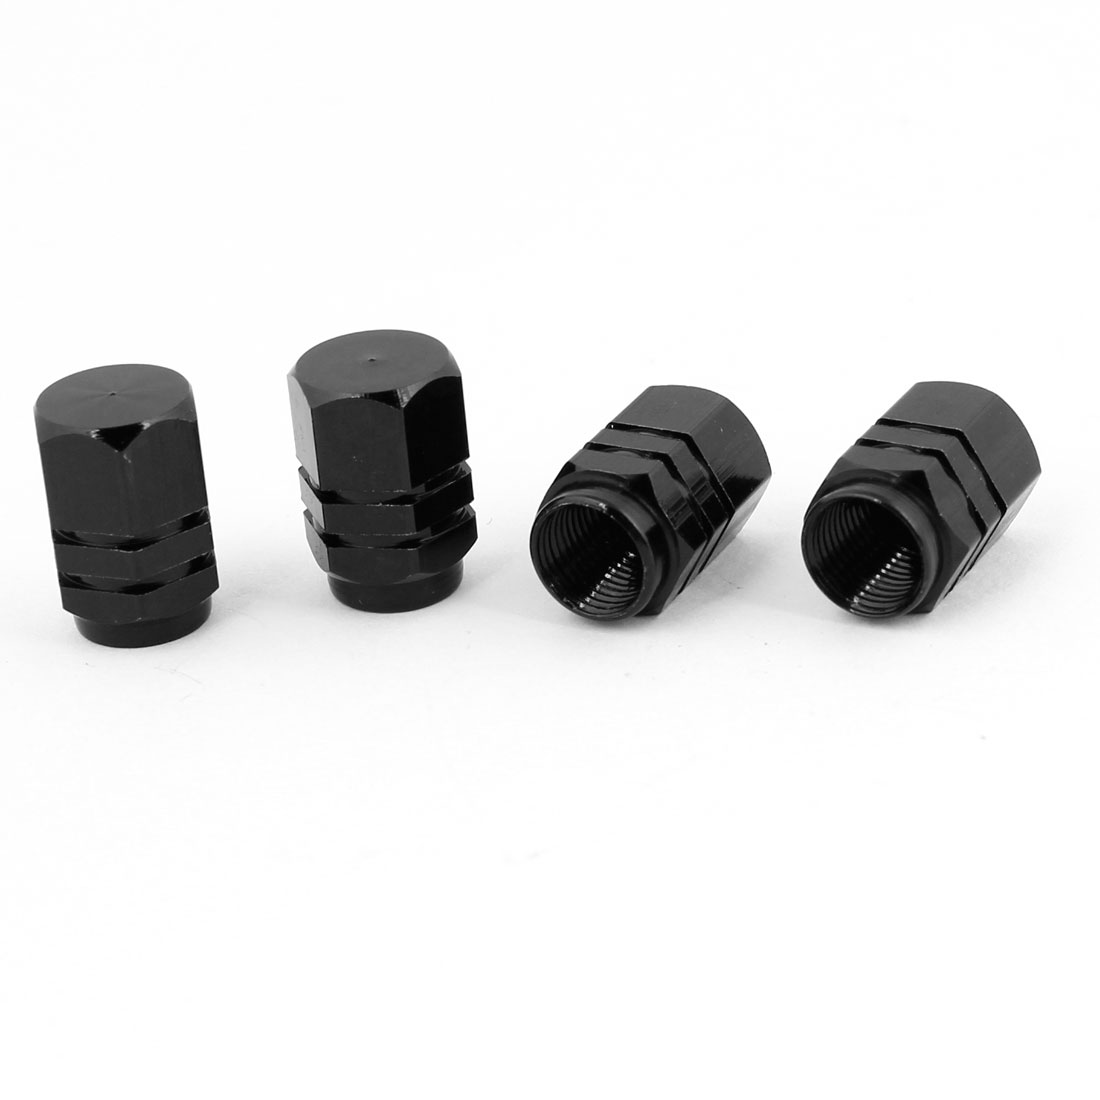 4pcs Hexagon Tyre Tire Valve Stems Caps Cover Black for Vehicle Car